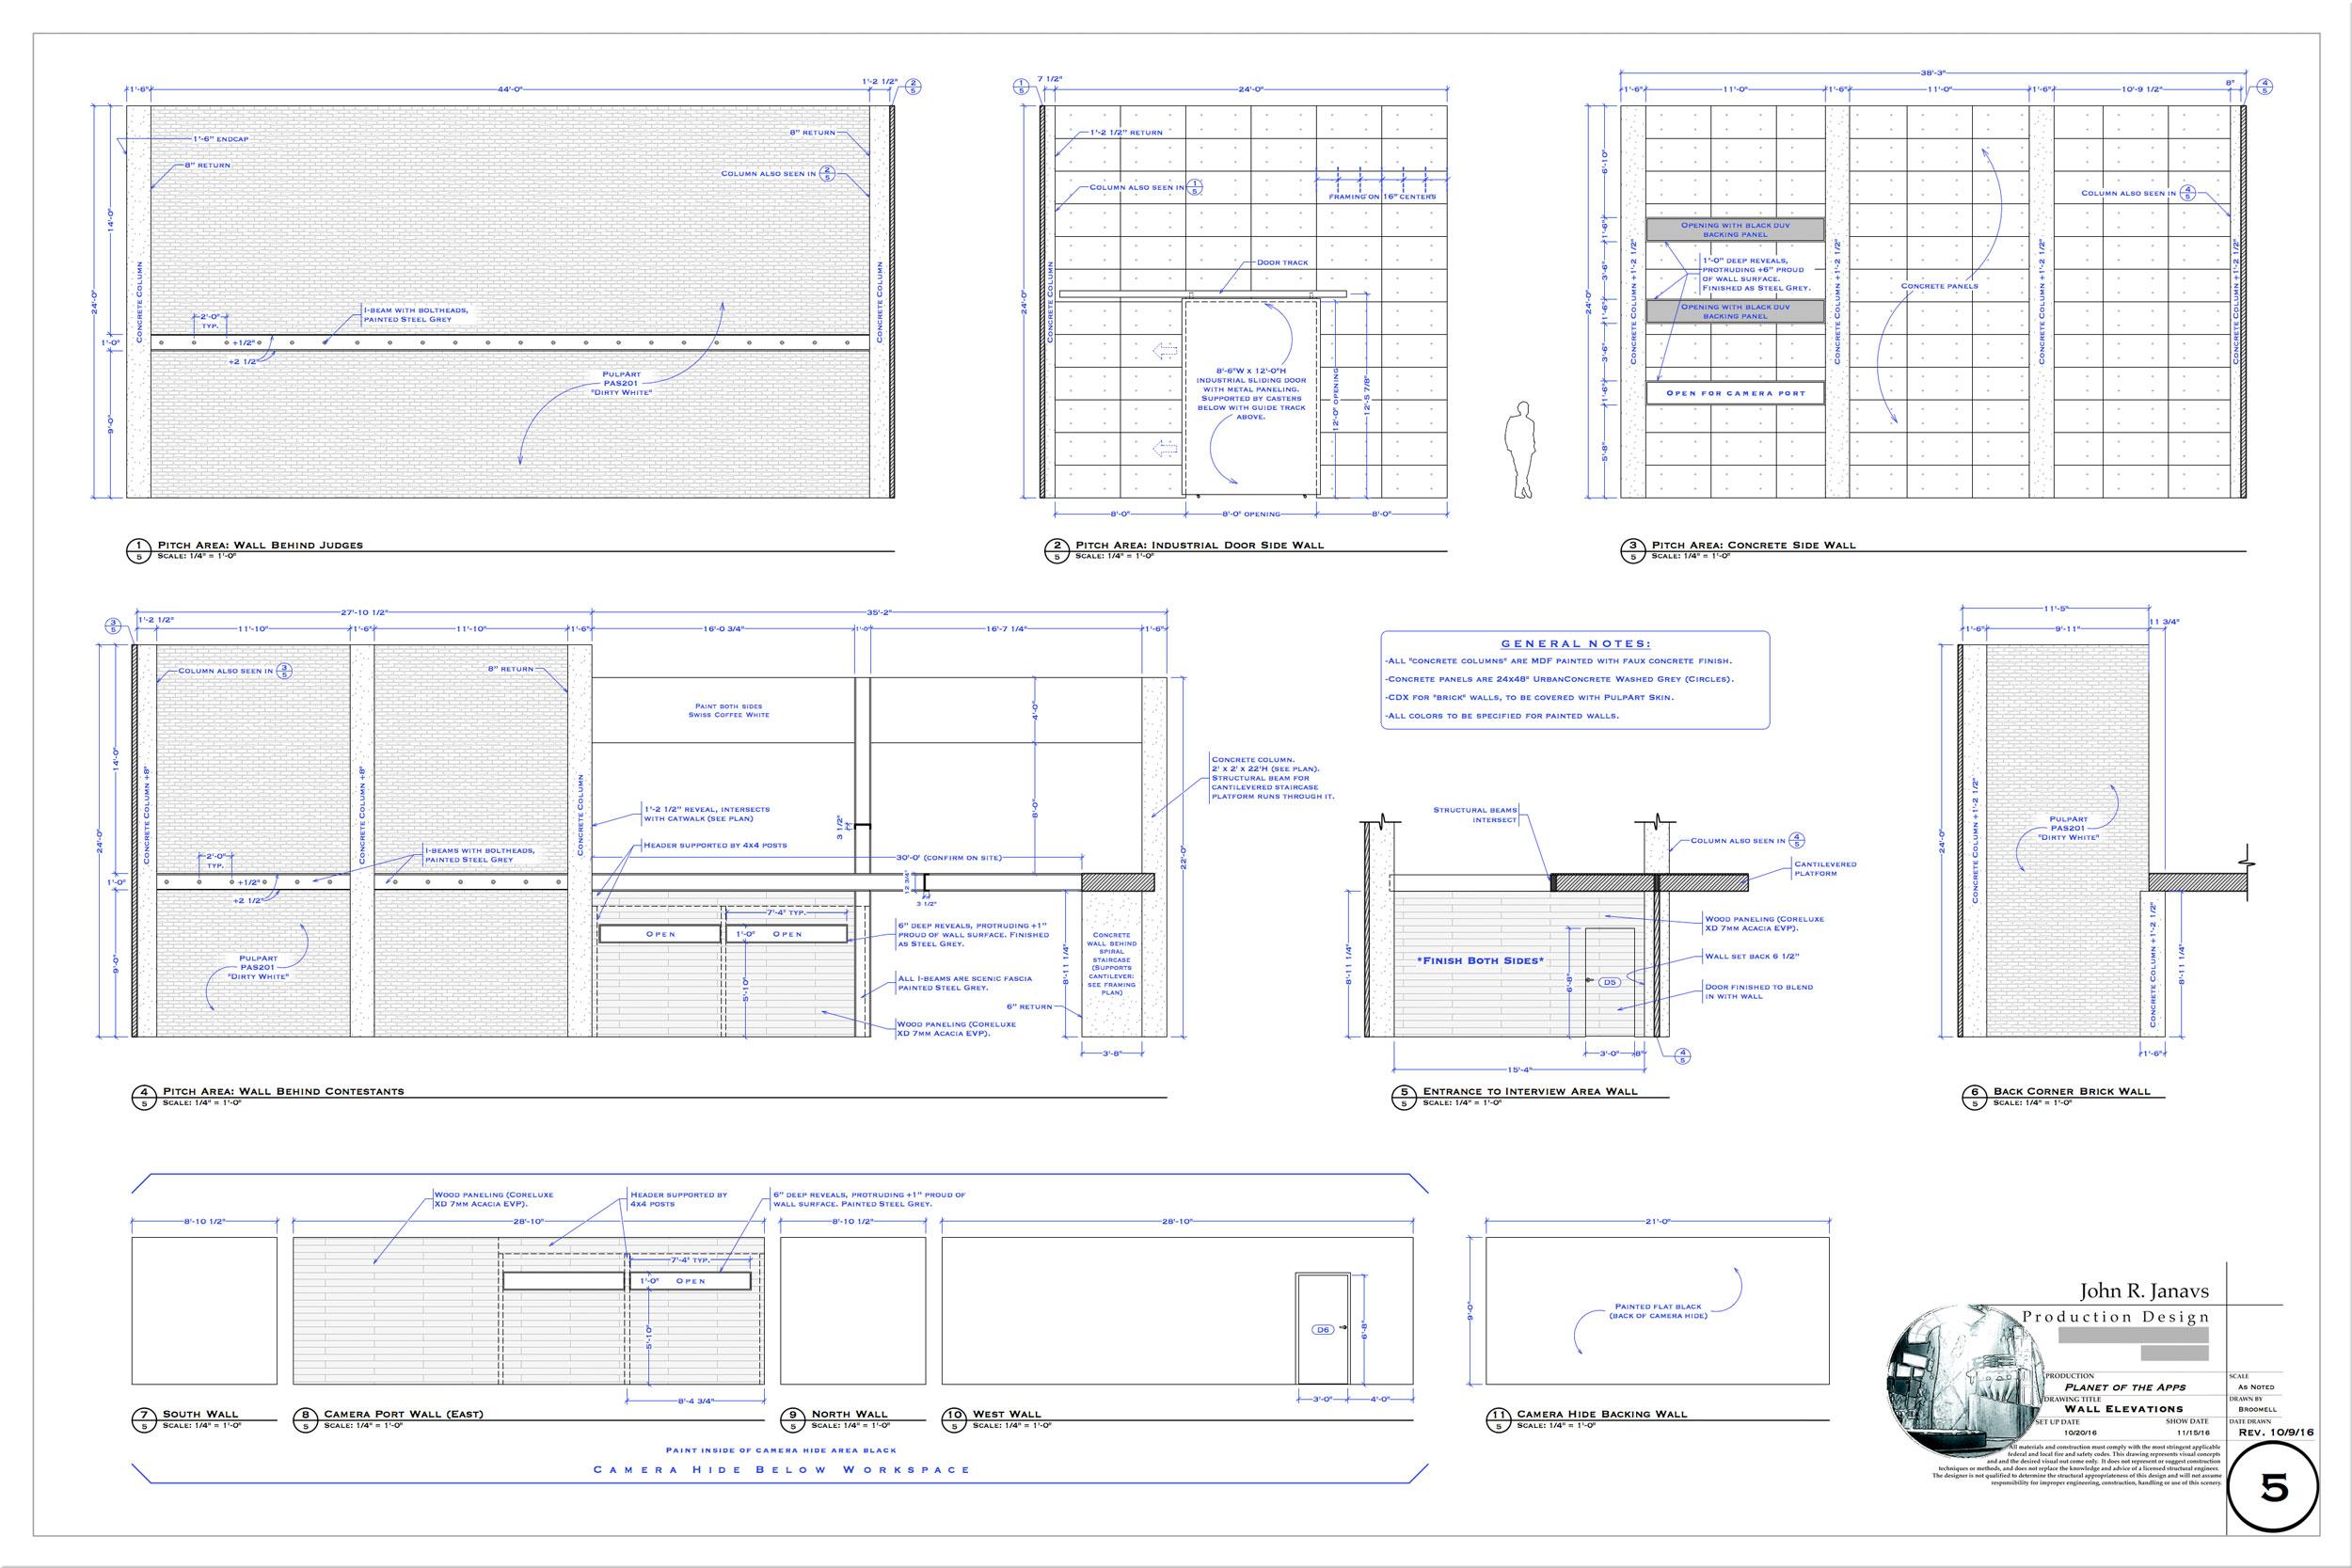 andy-broomell-set-design-drafting-pota1.jpg